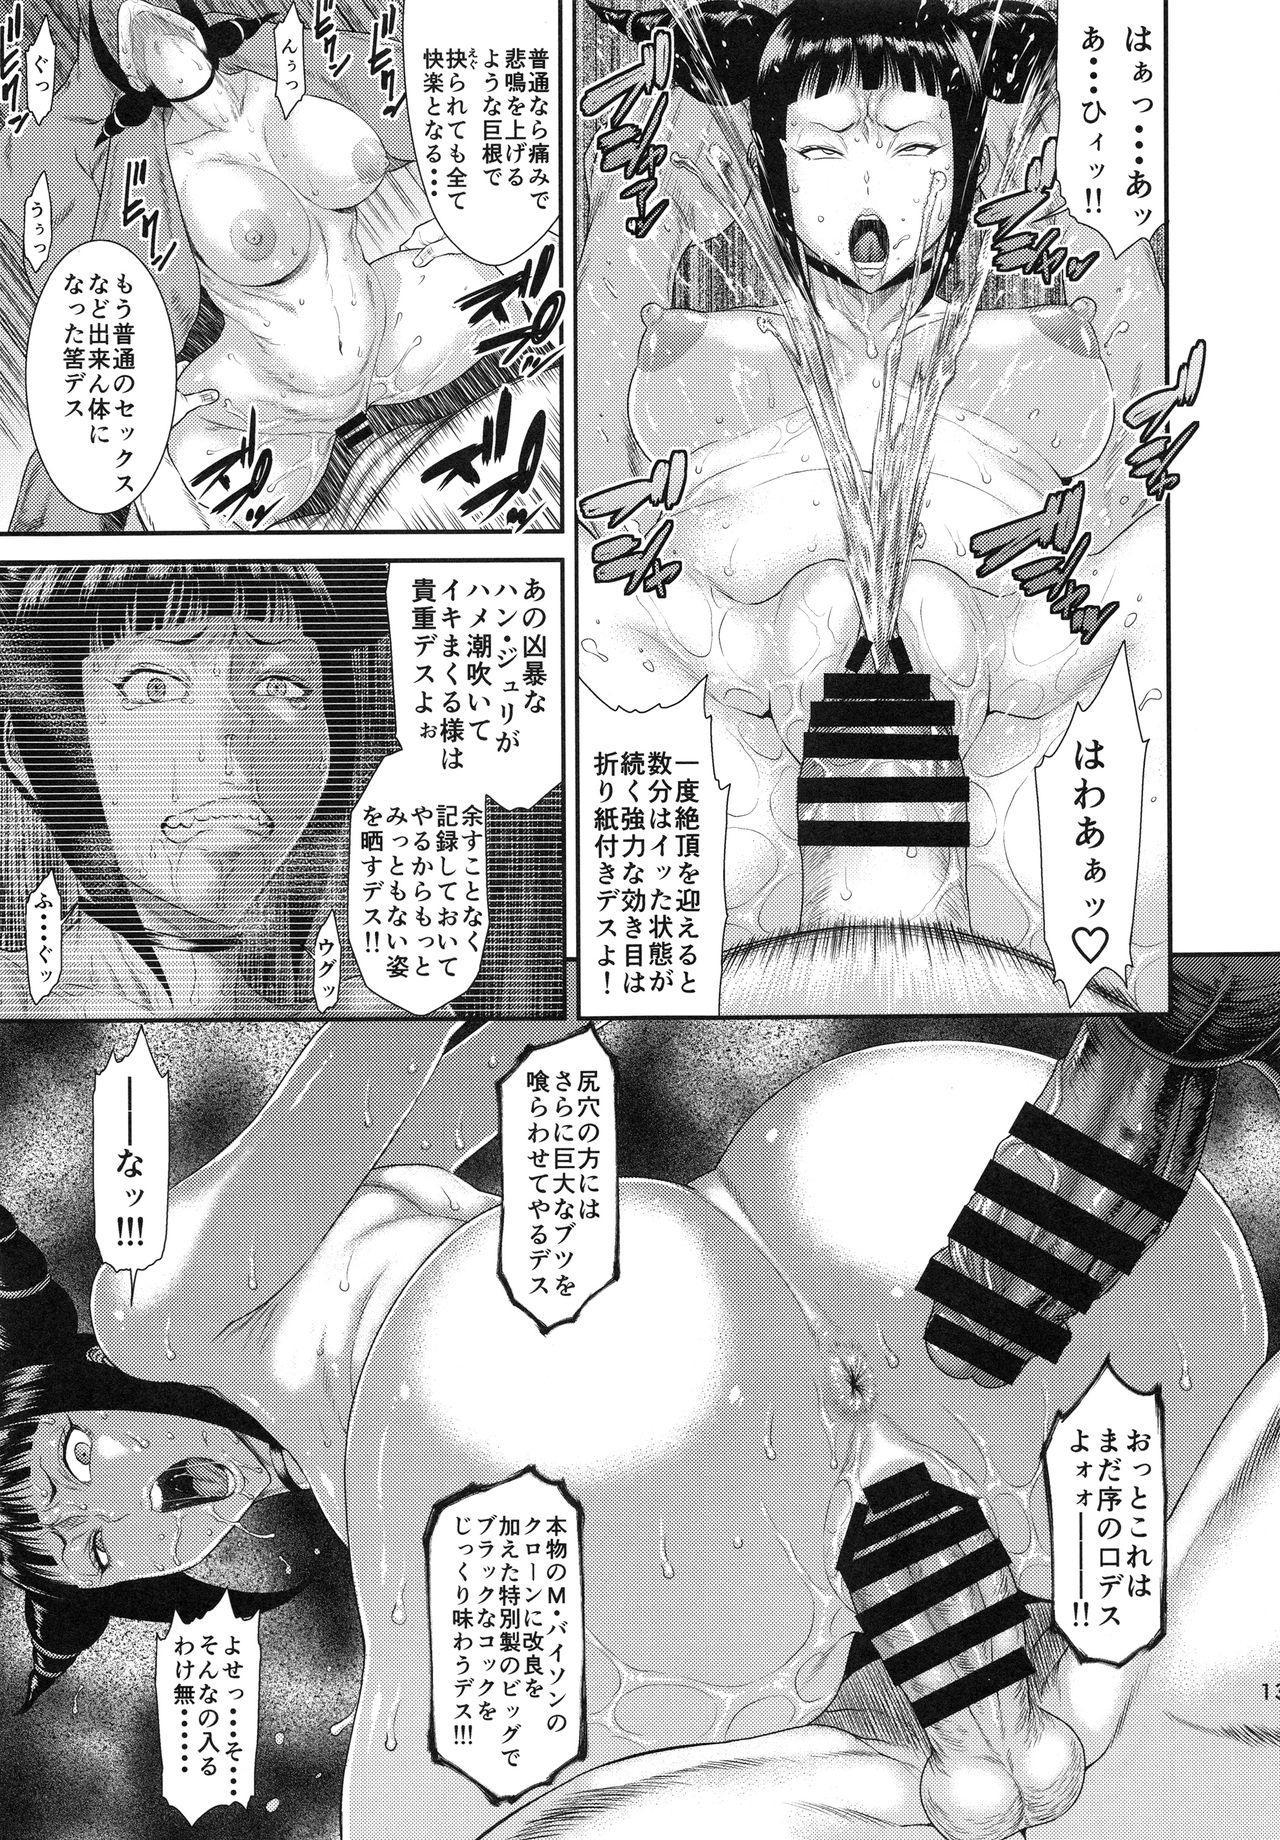 Jaaku - Wicked 11